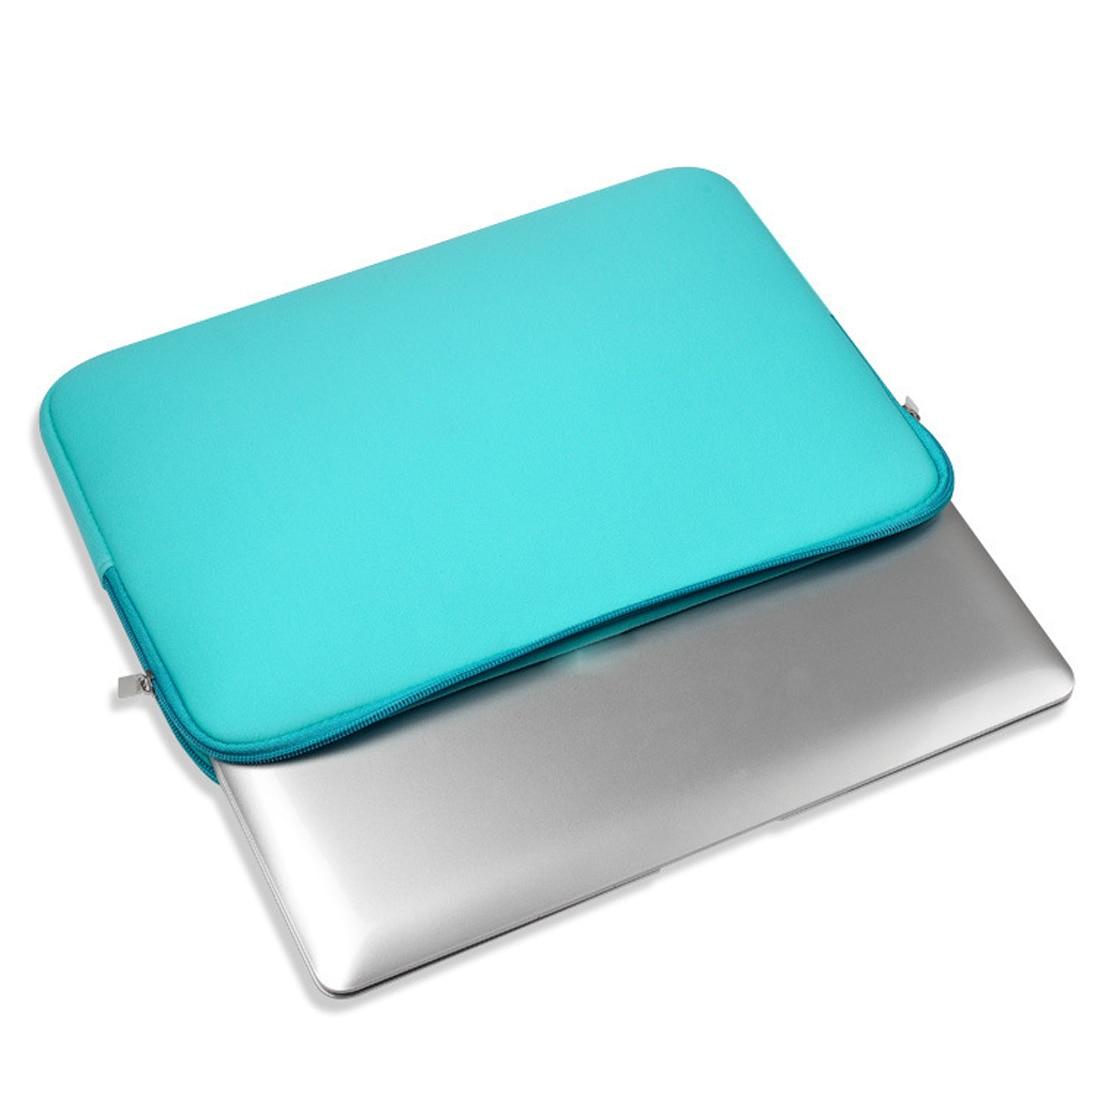 "Fashion Portable Notebook Cover Neoprene laptop Notebook Case Women Men sleeve Computer Pocket 11"" 13""15"" for Macbook Pro Air"